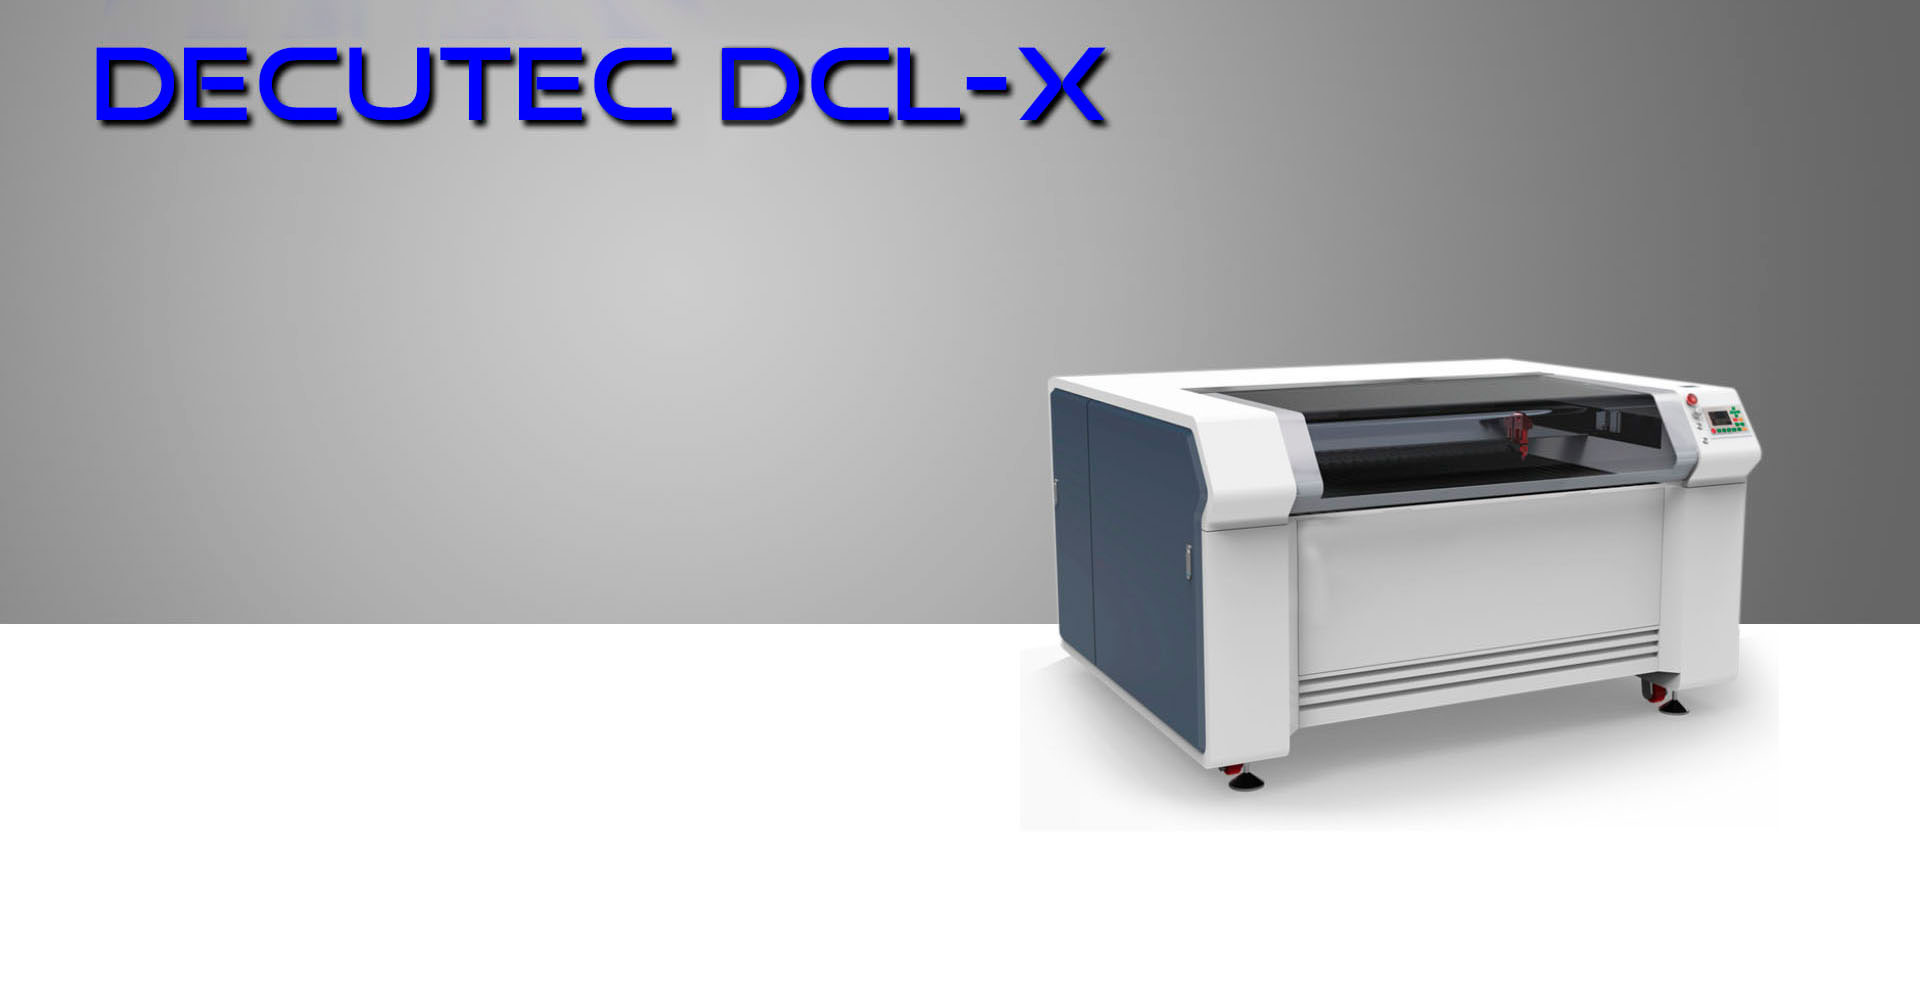 Máquina láser de corte y grabado BLCX euracryl Polishmachine